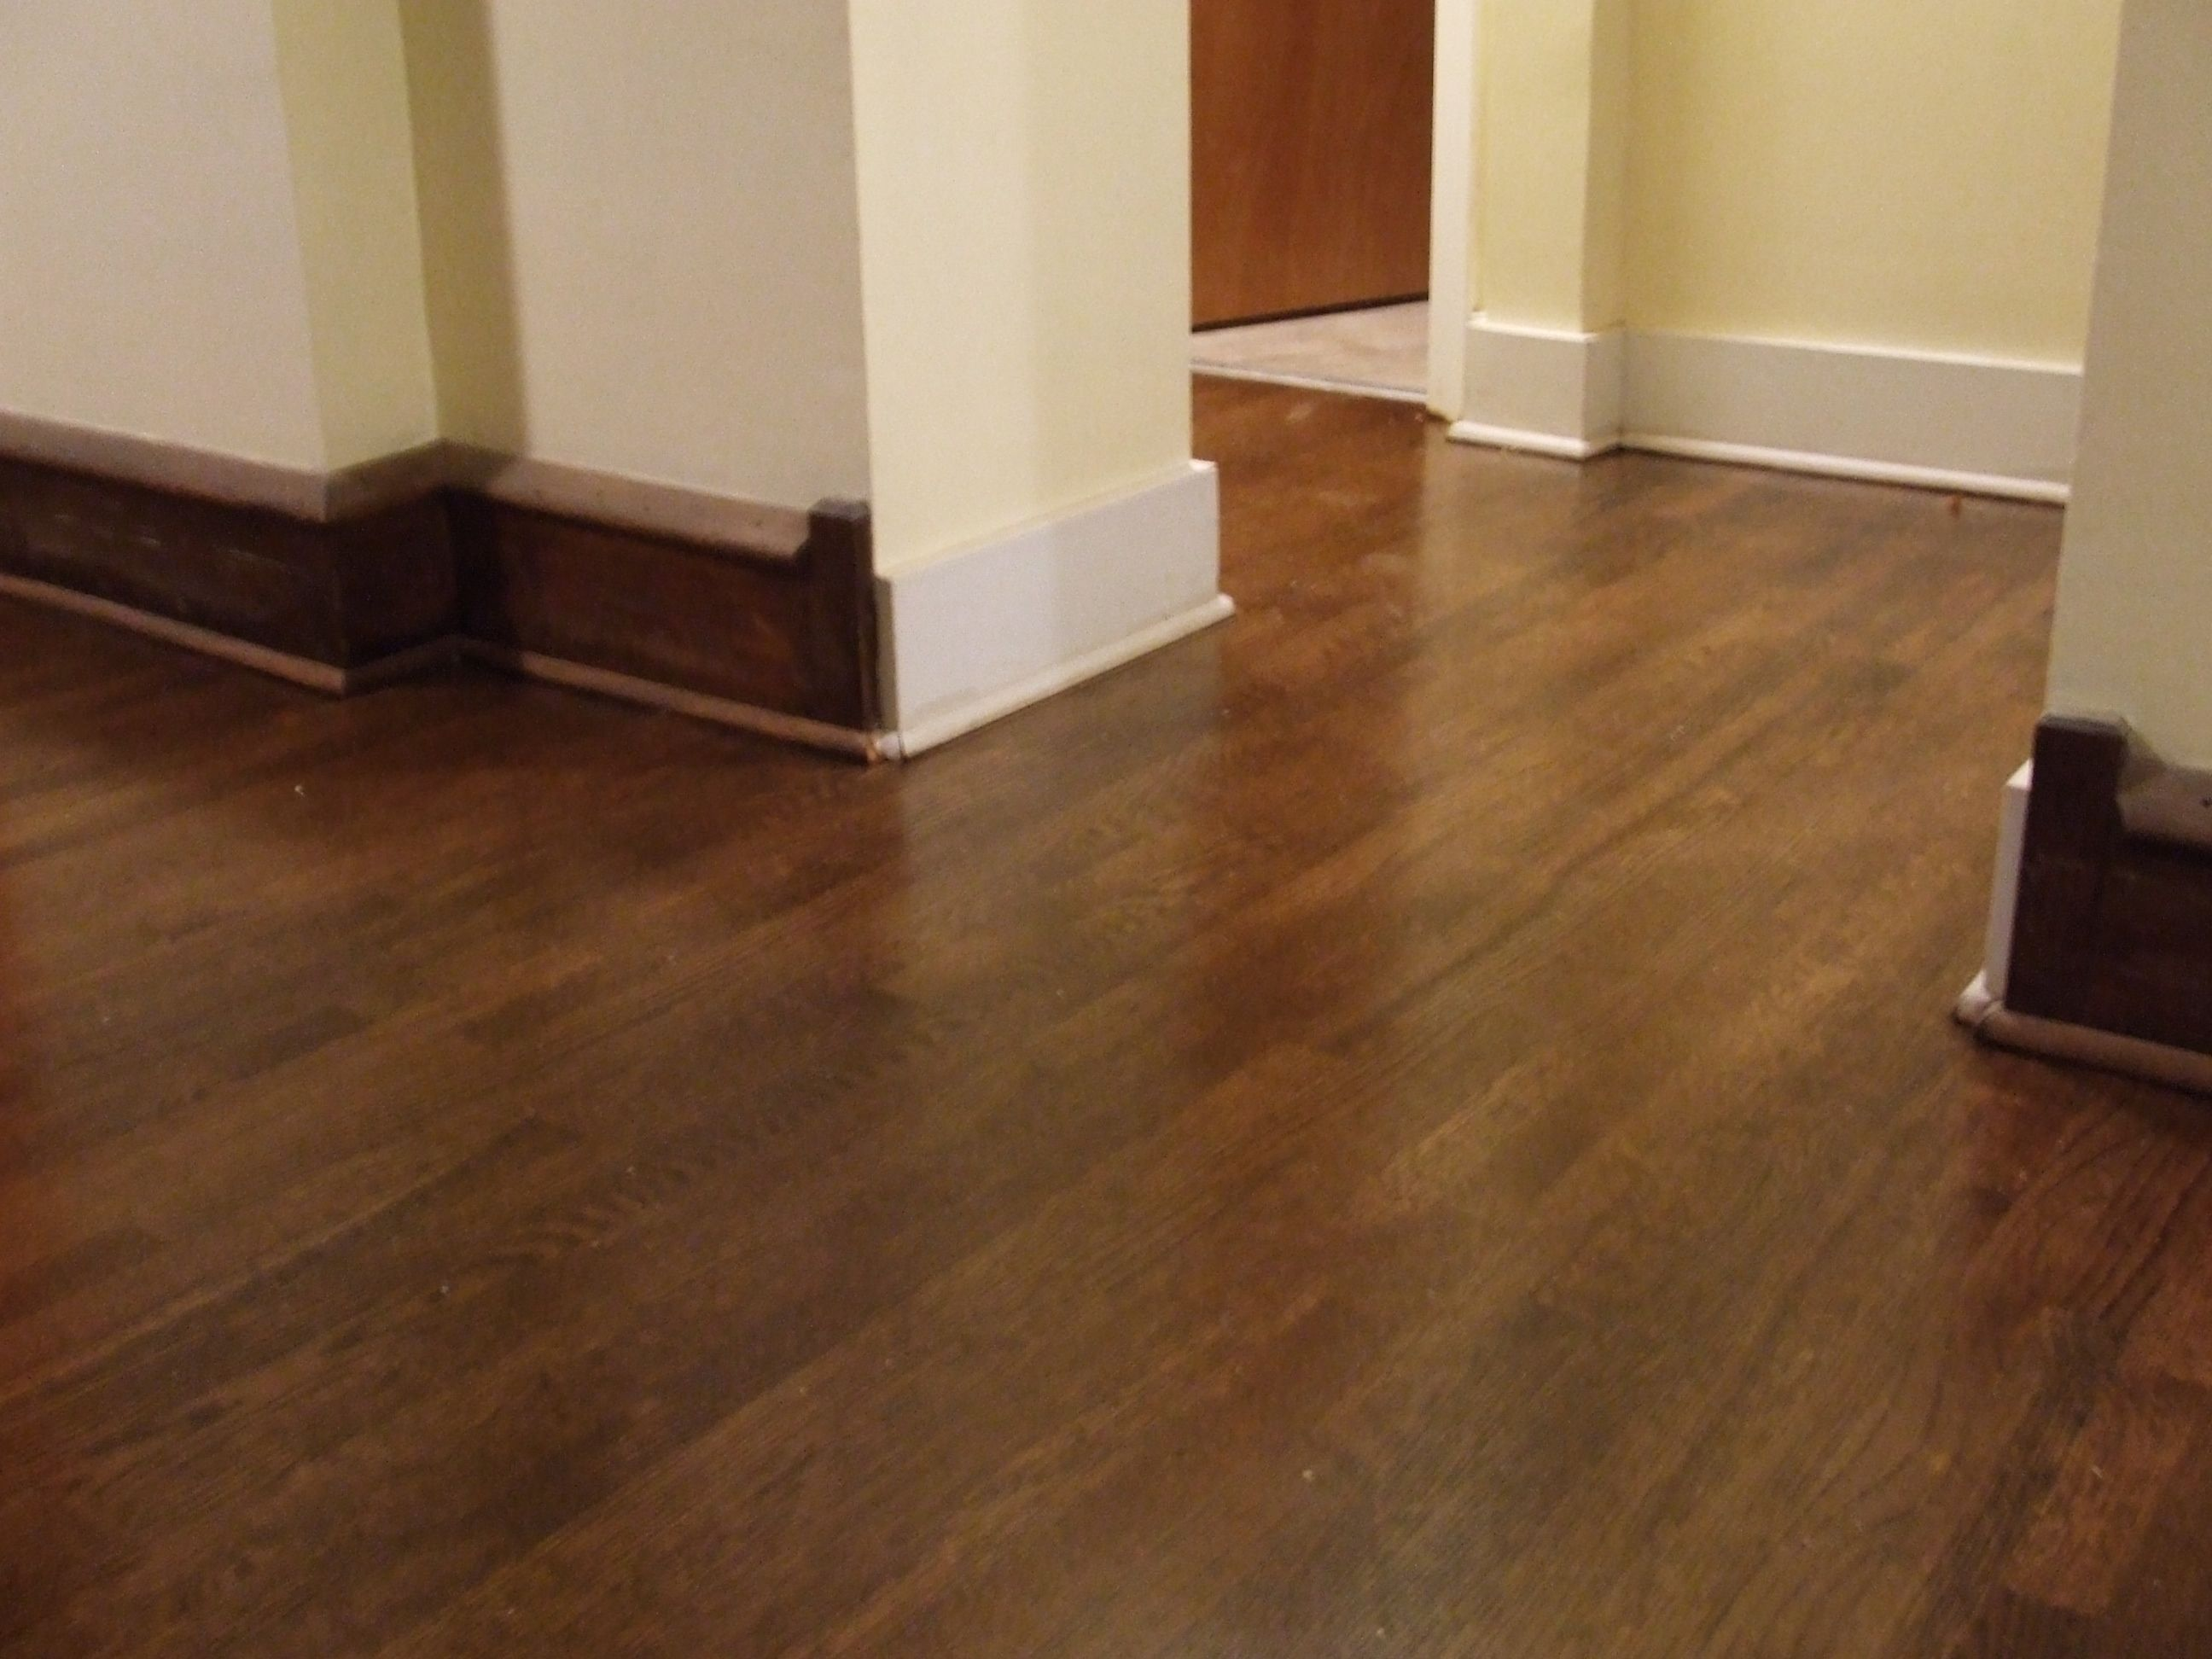 new hardwood floor refinishing pictures + stain